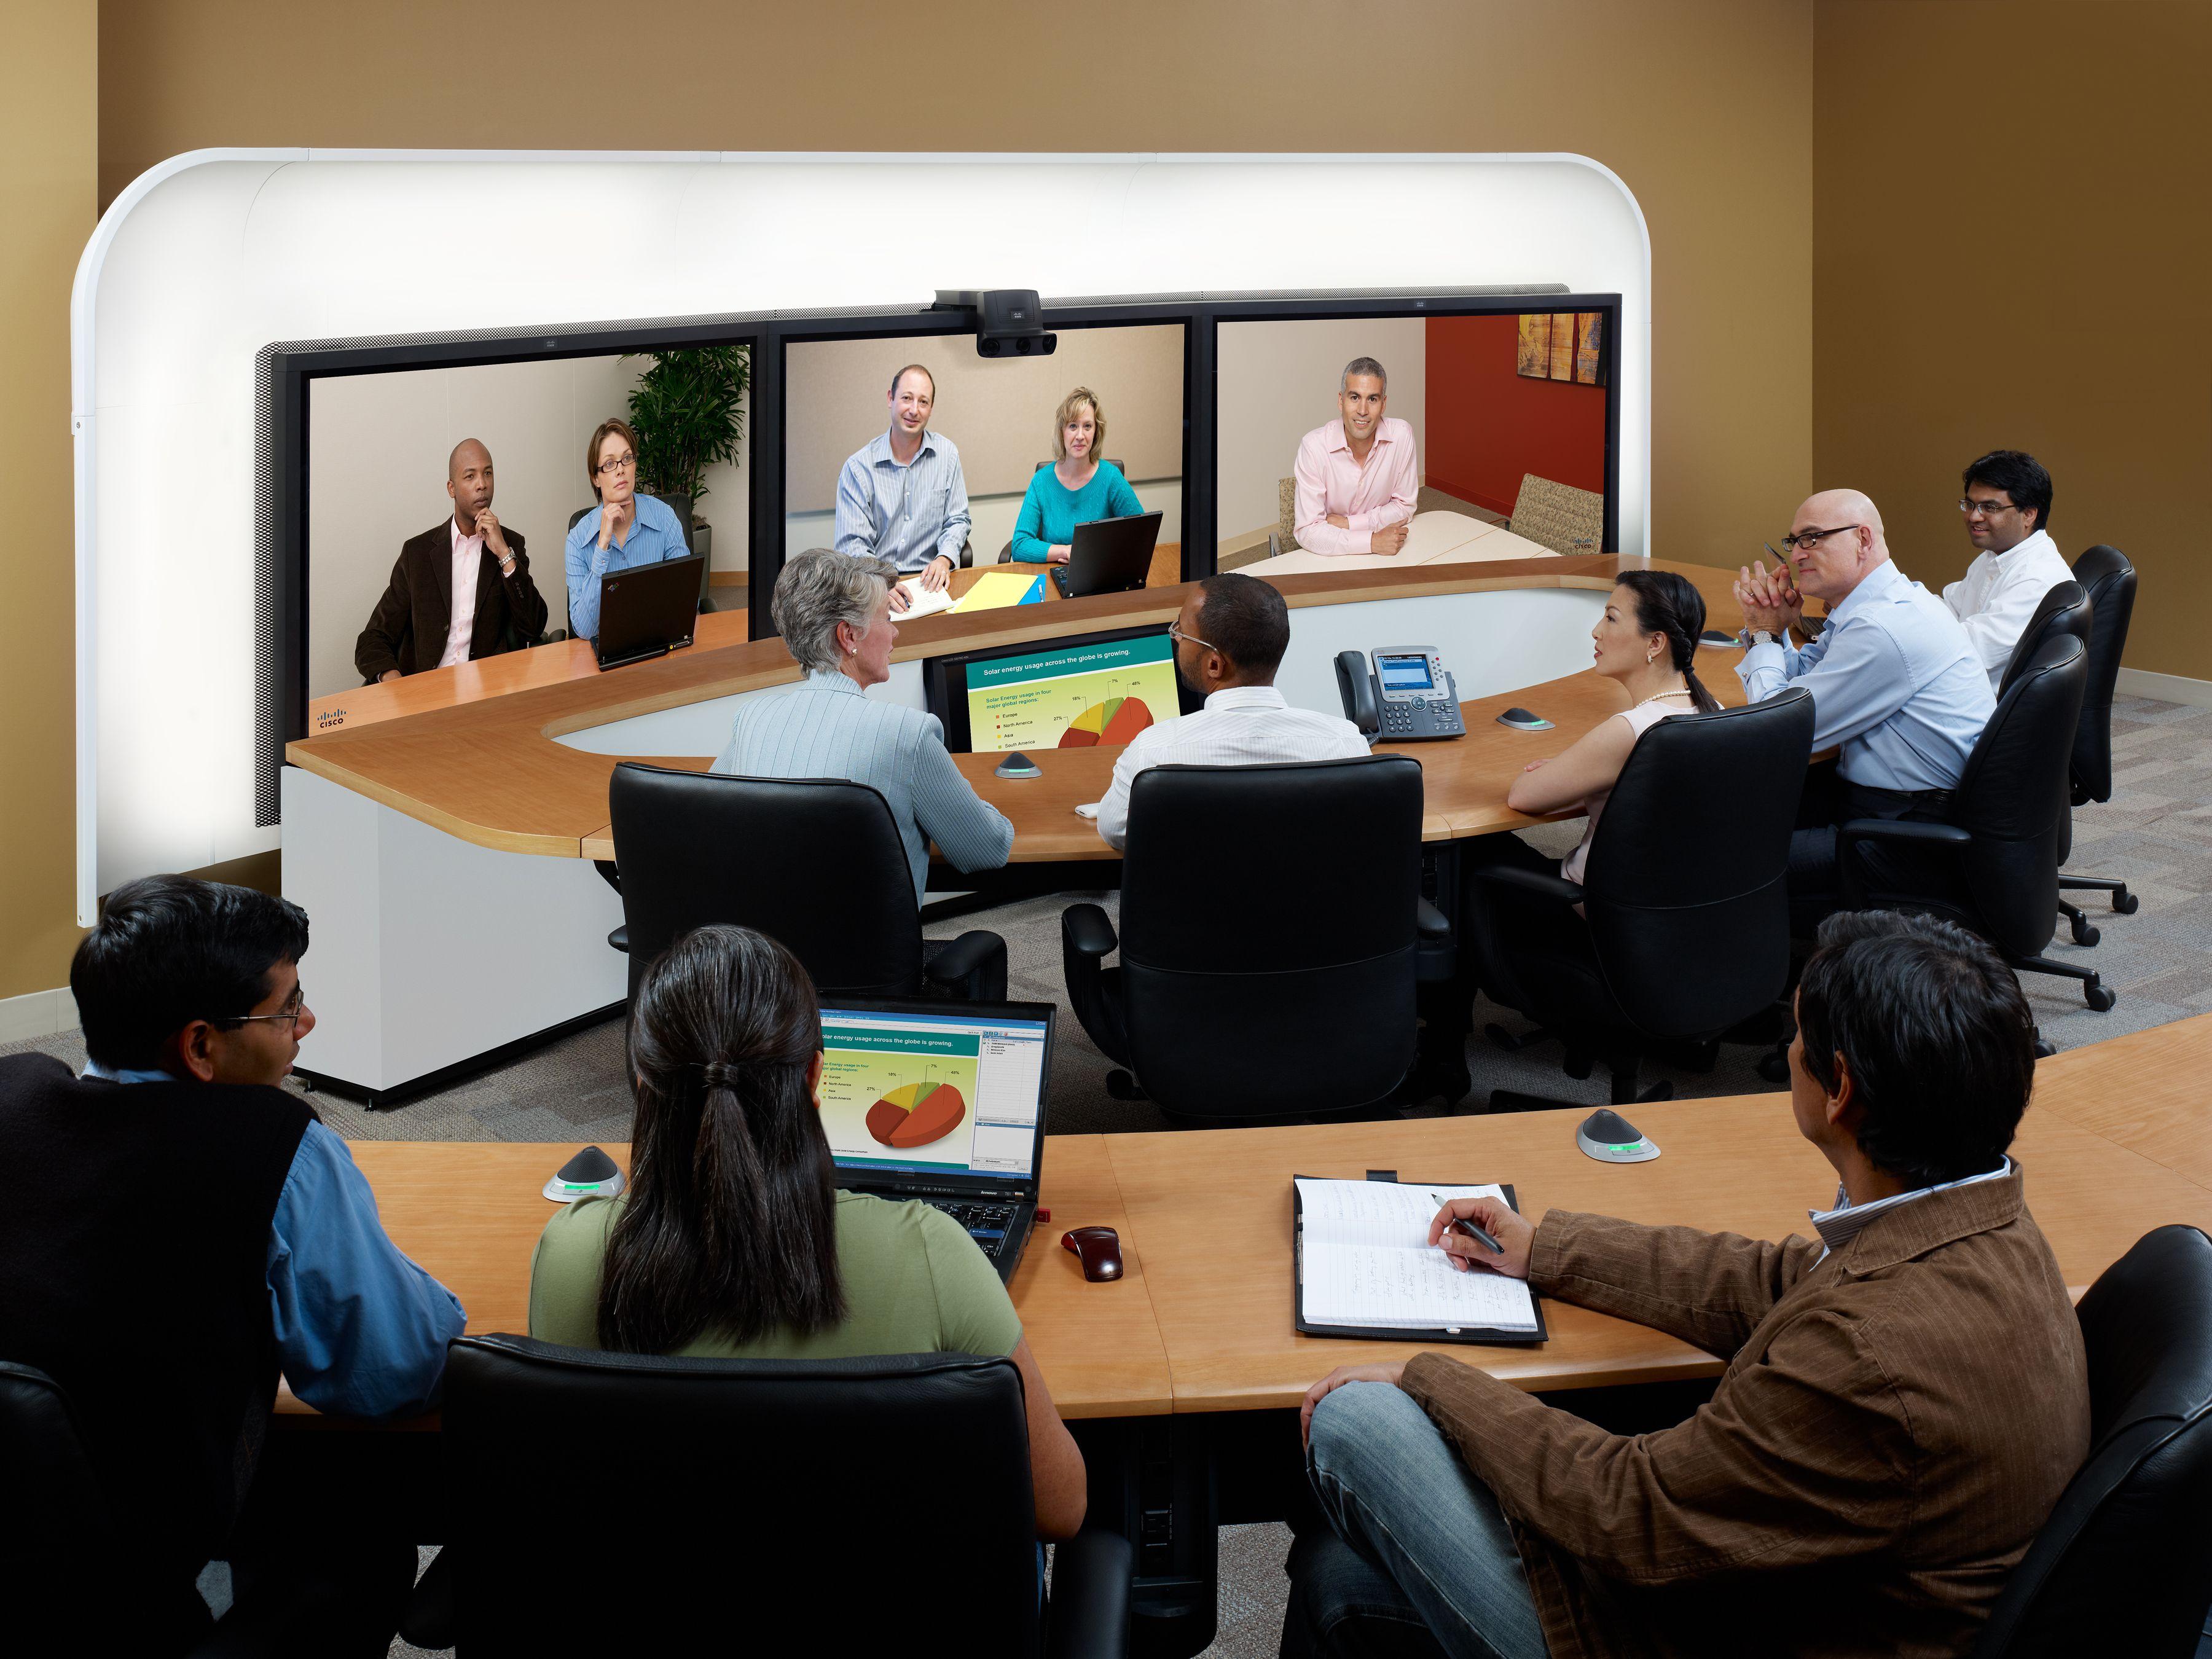 Tele-presence; Cisco CTS 3000 series 2